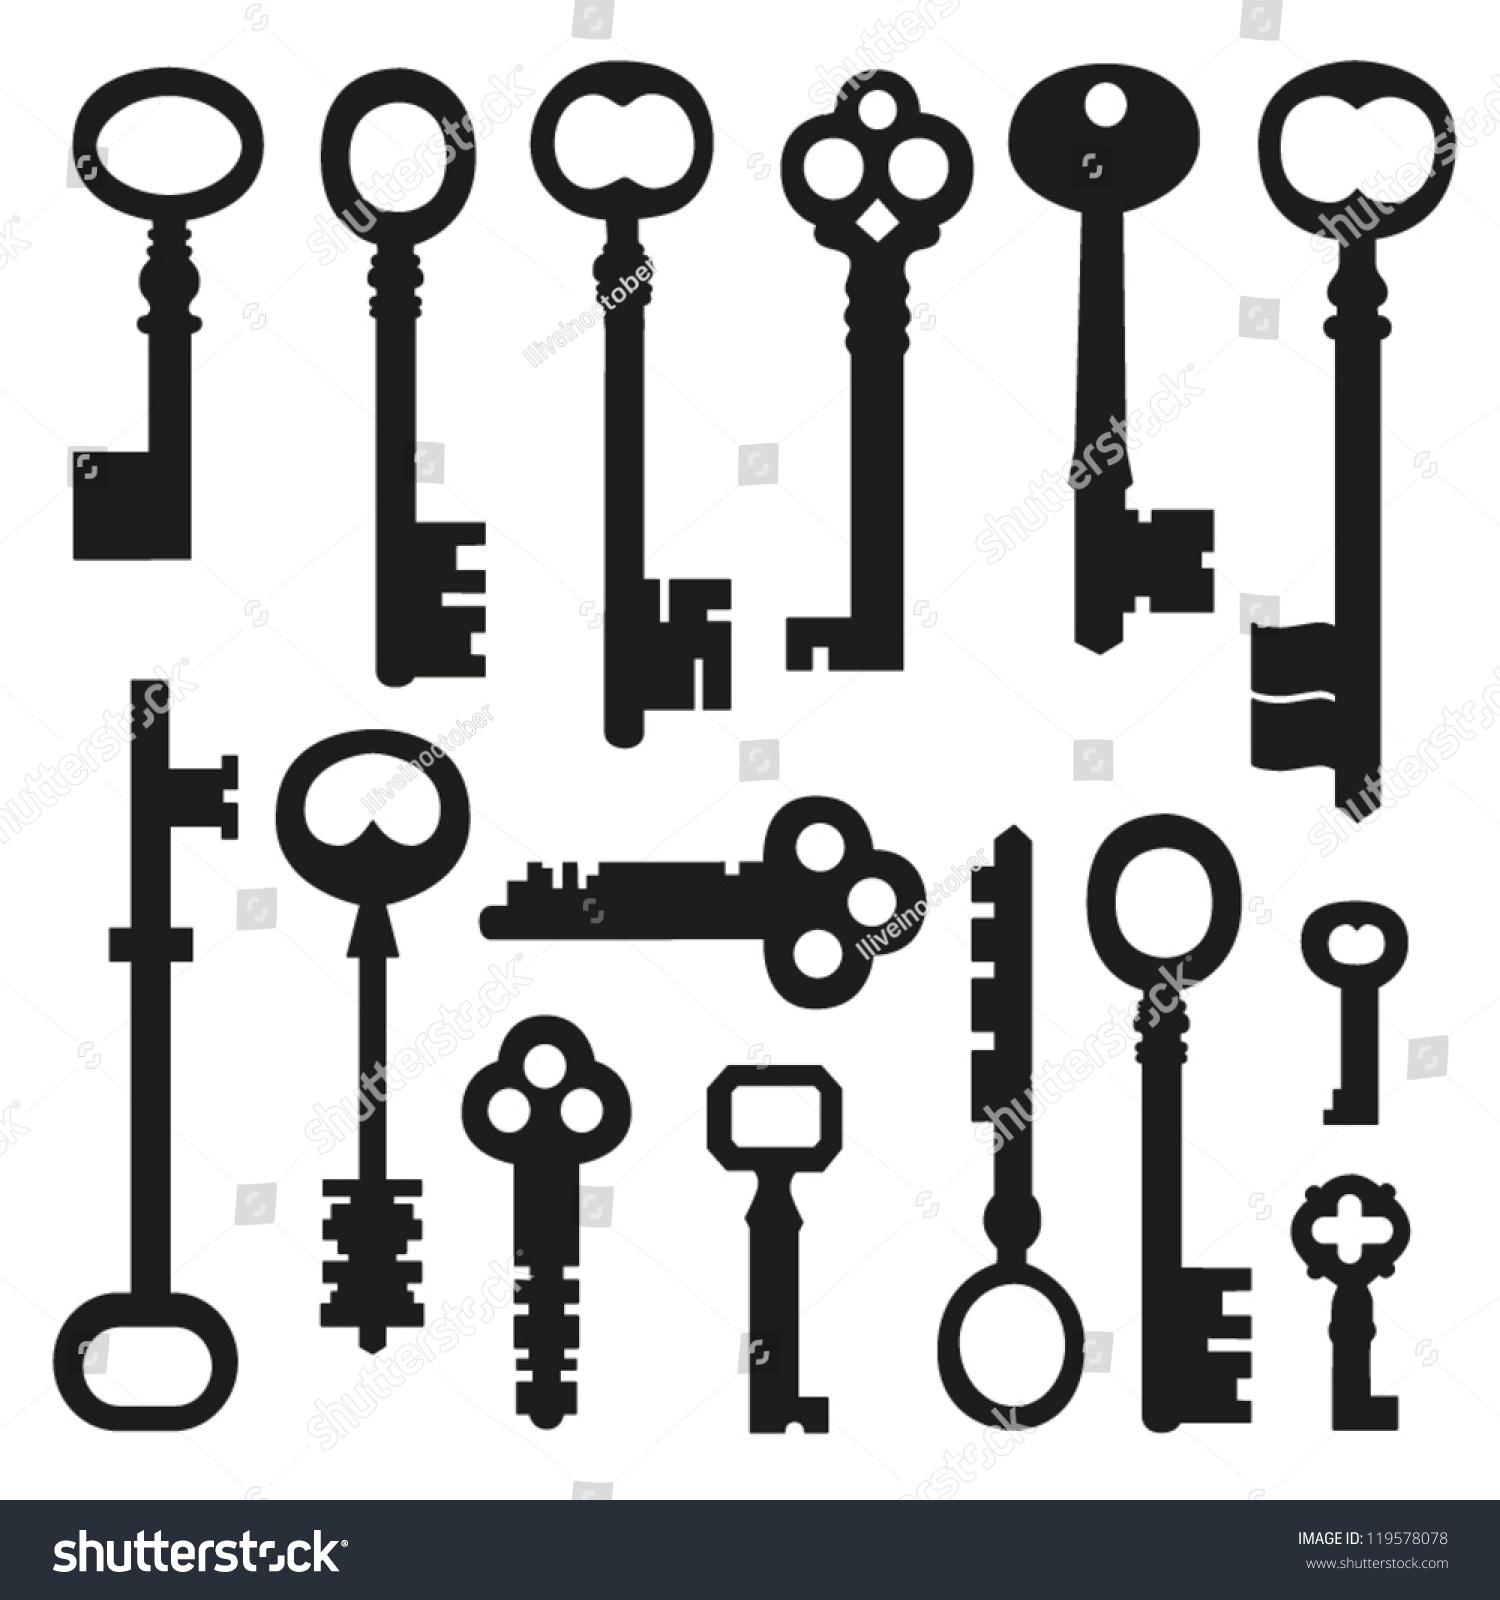 Vector Key Illustration: Set Different Key Shape Vector Illustration Stock Vector